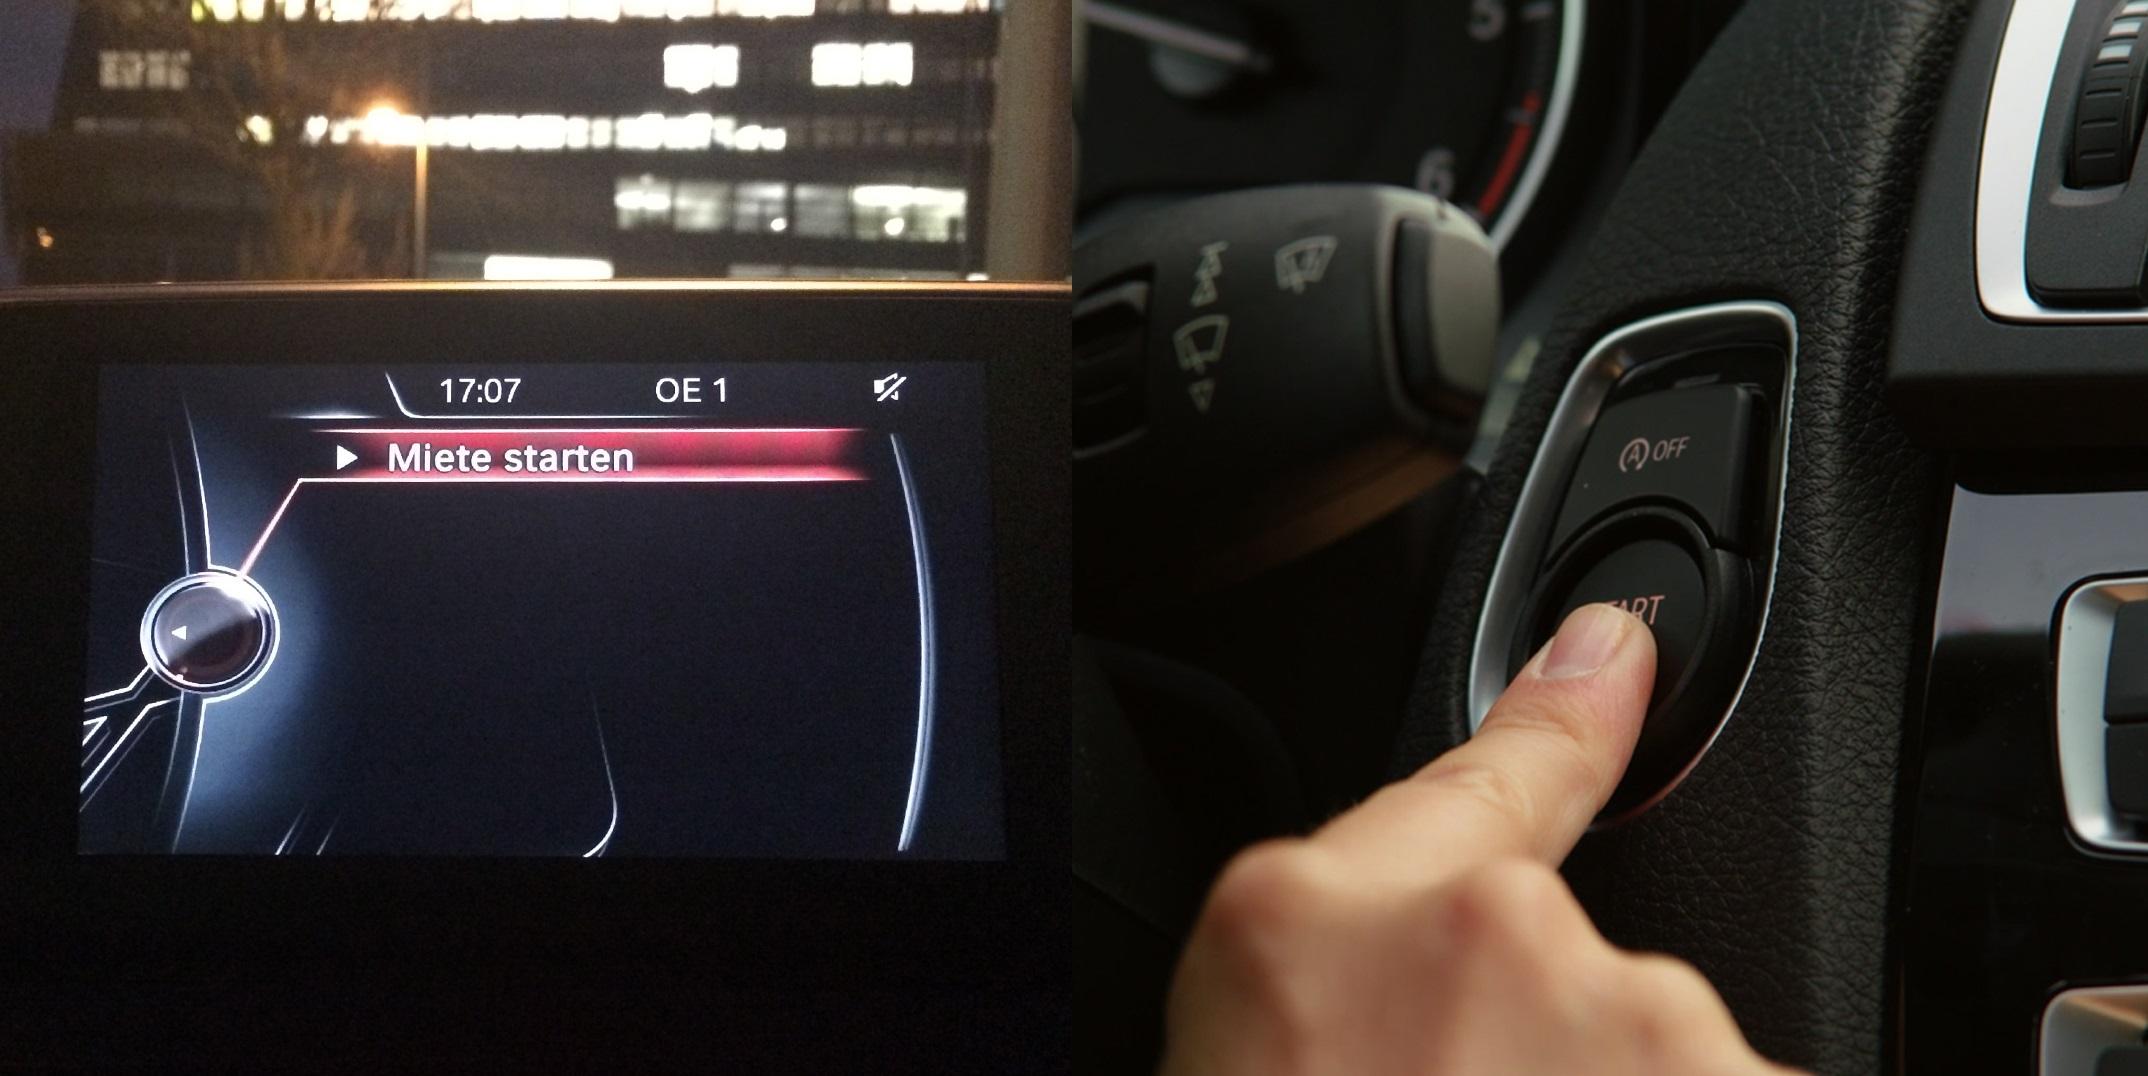 DriveNow Carsharing Miete Beginnen